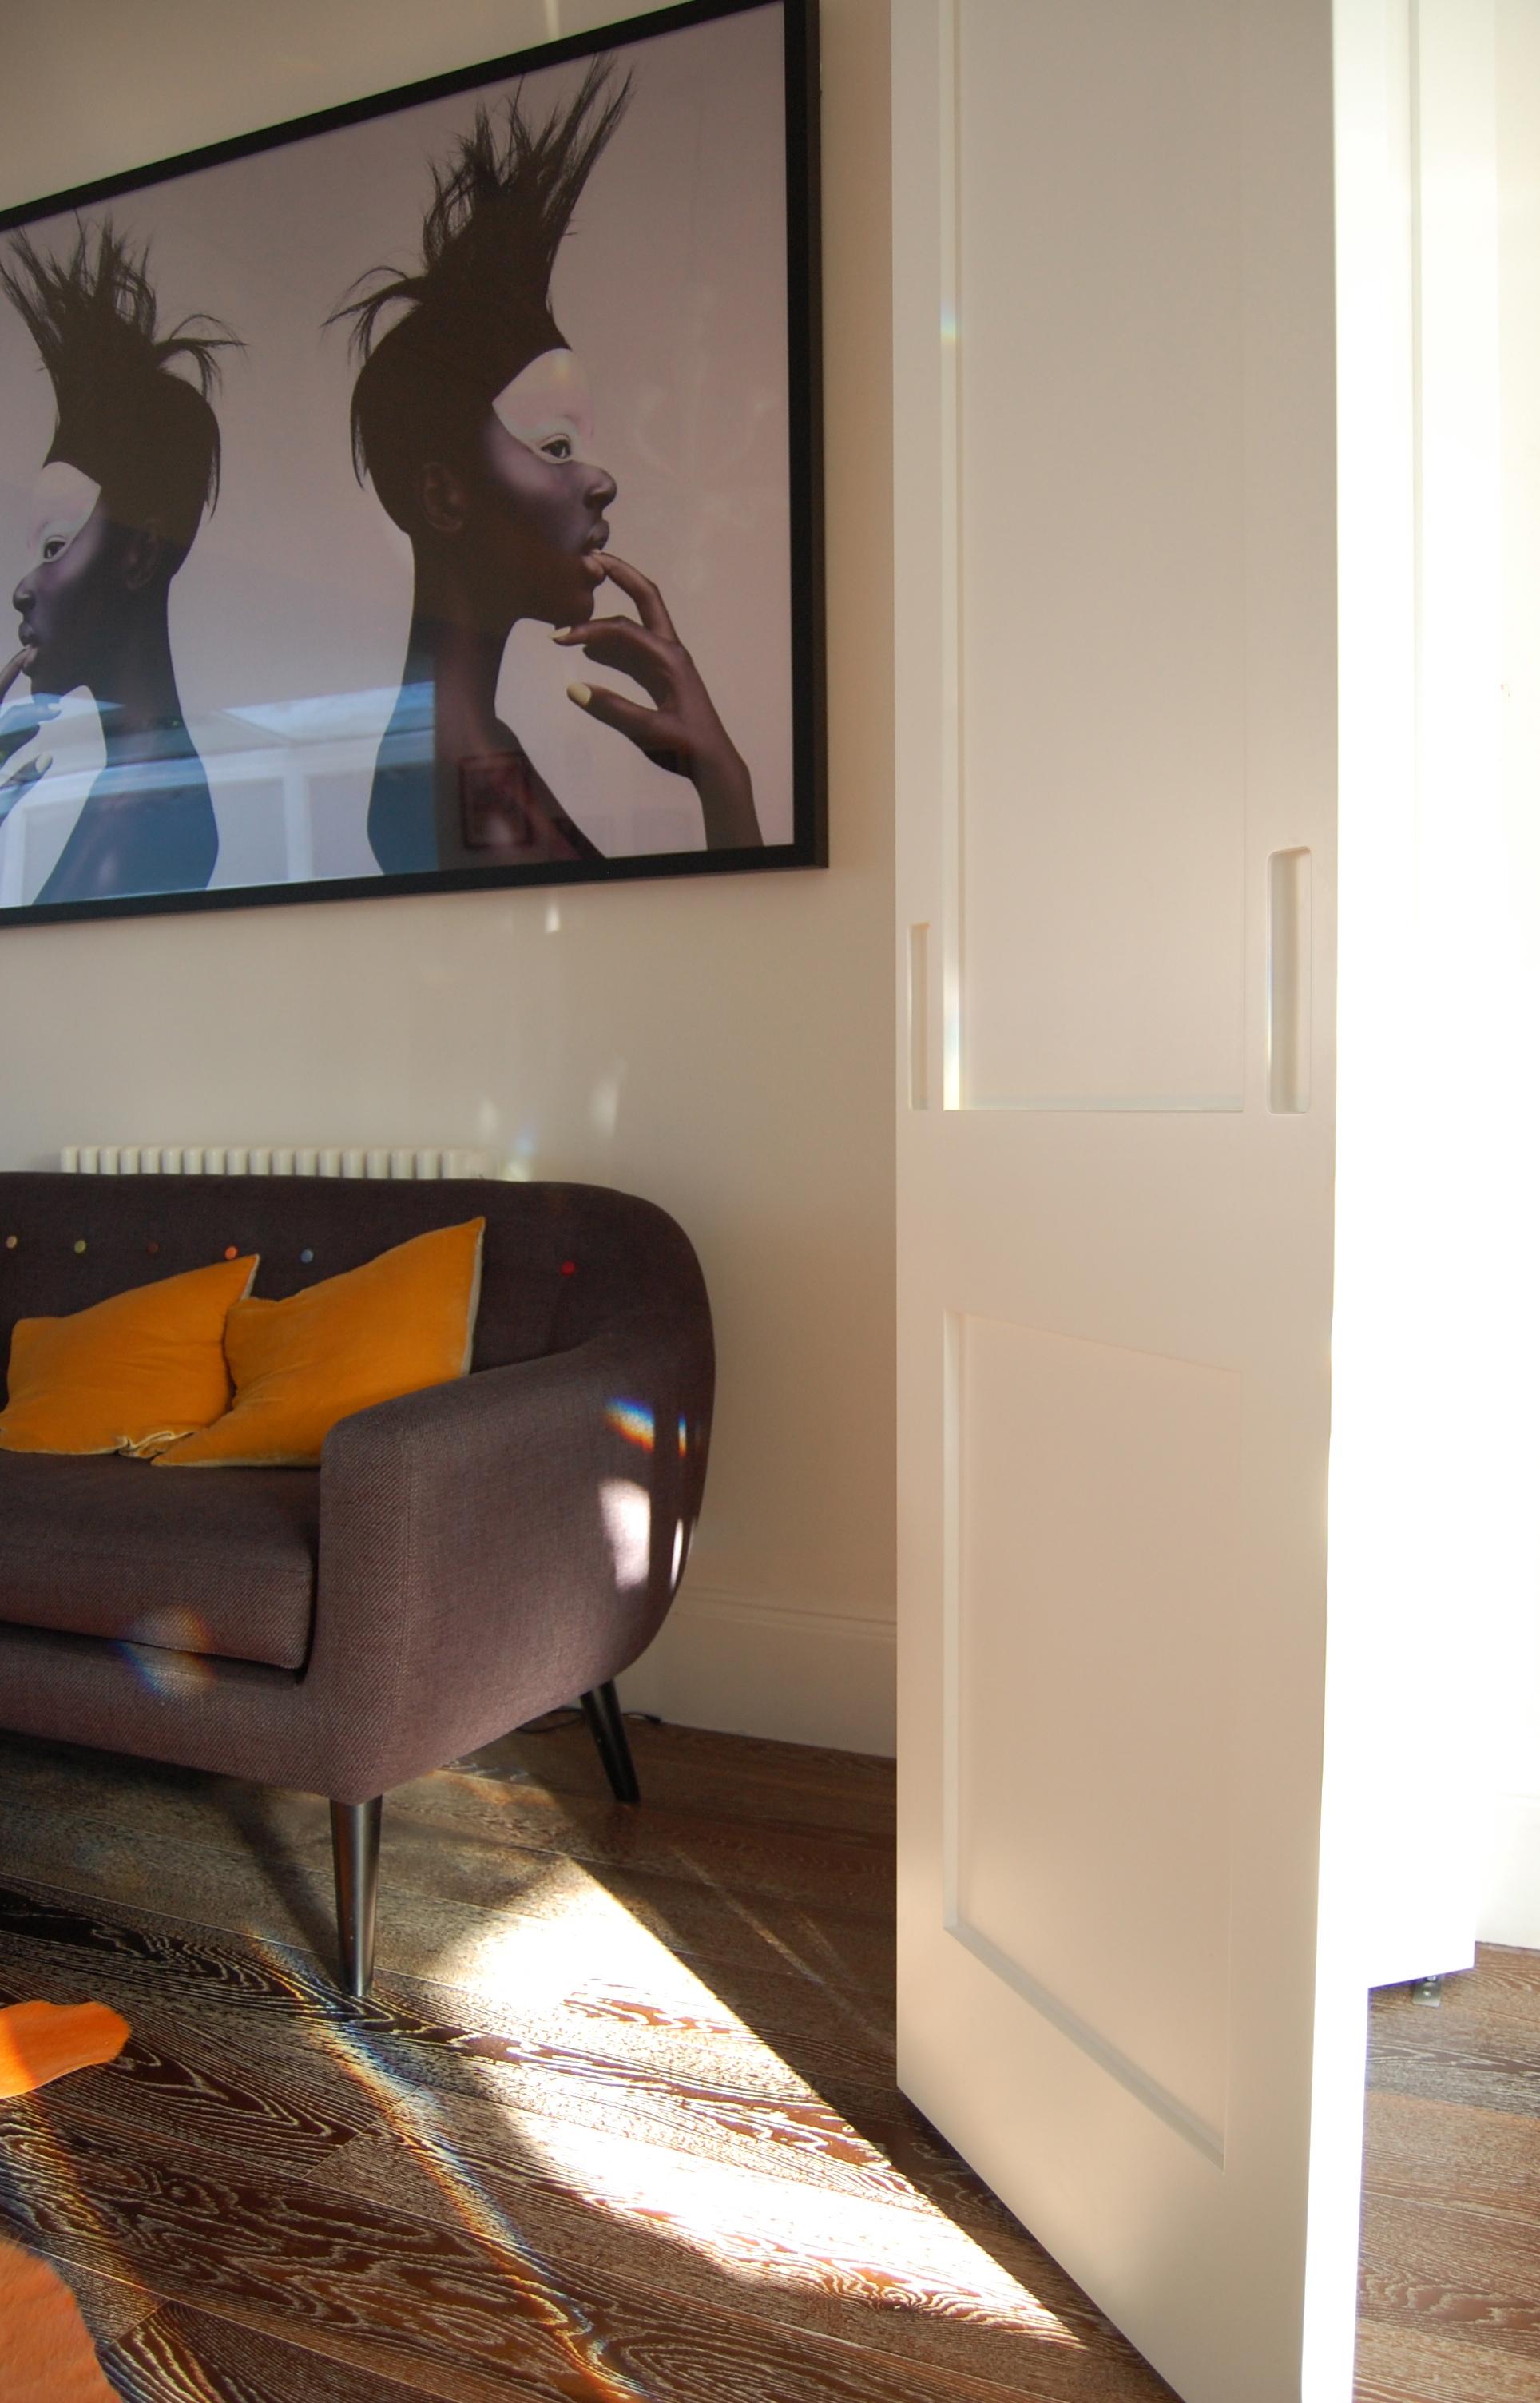 Grain_Bespoke_Furniture_White_Sprayed_Room_Divider_Sideboard_3.jpg